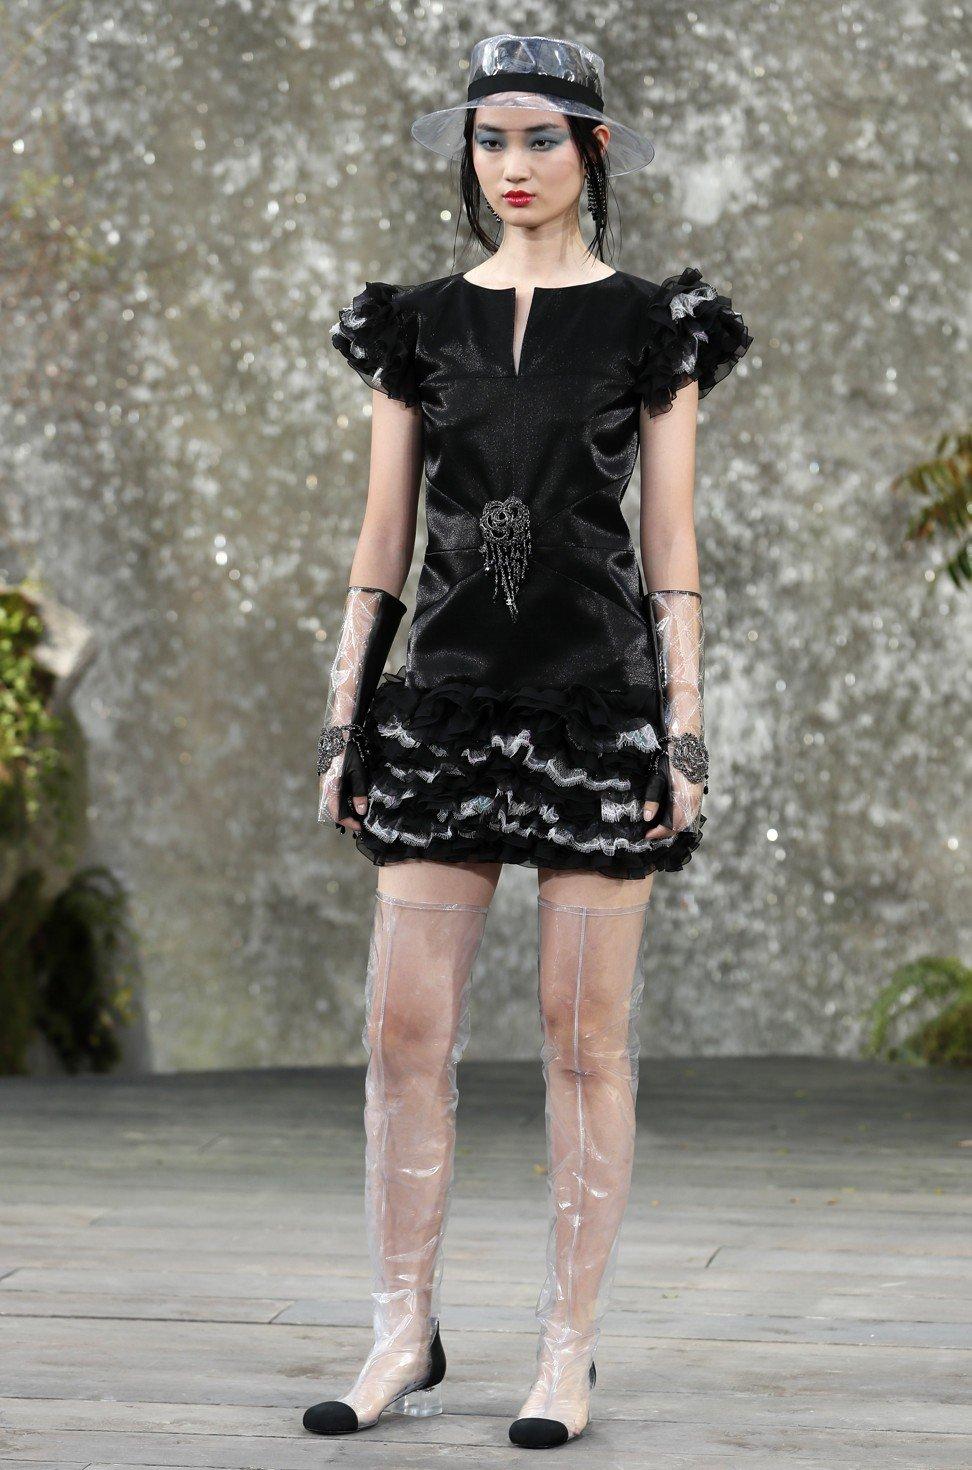 Model 2018 dress fashion